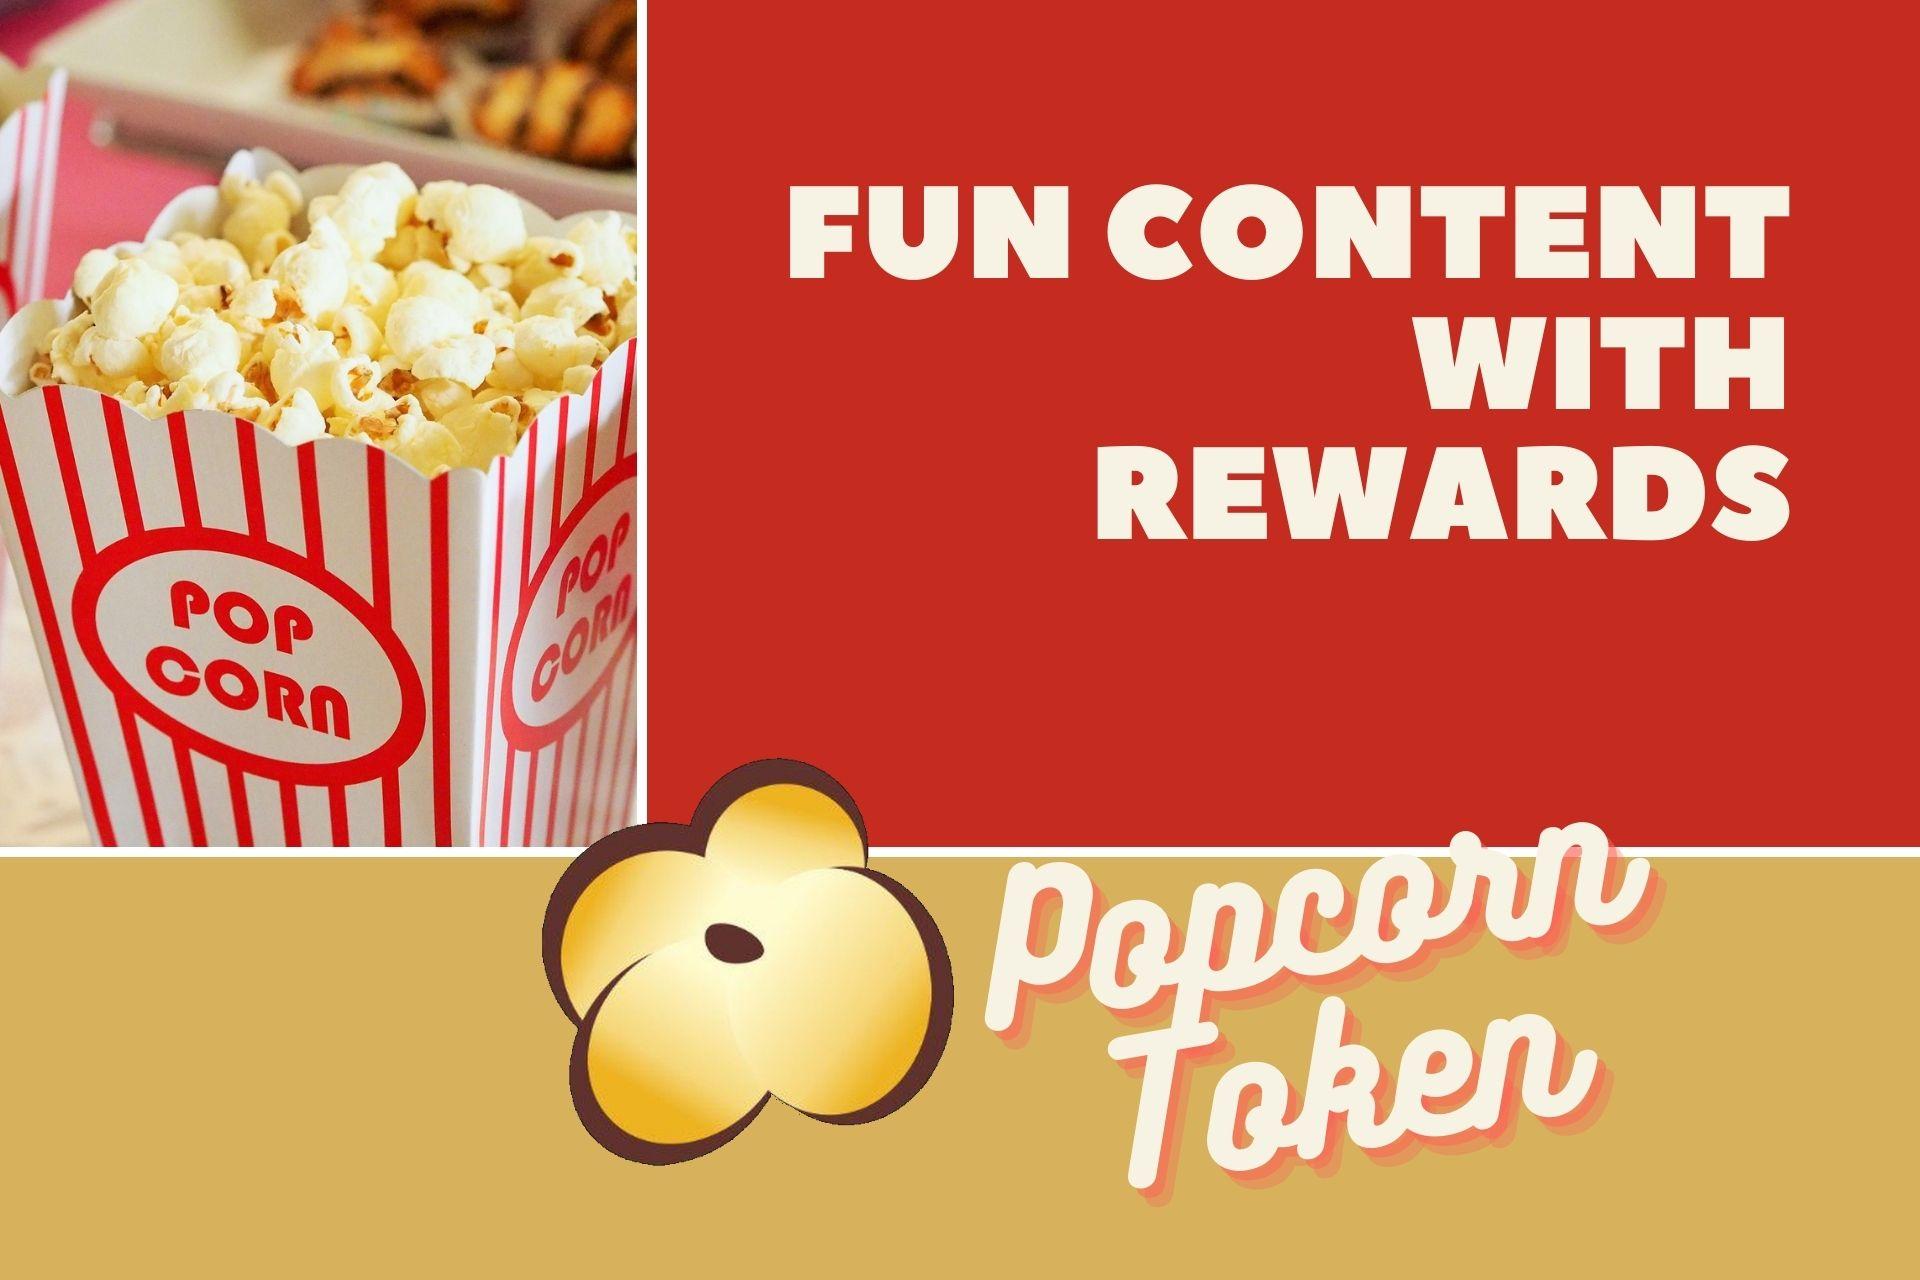 Popcorn: Fusing Fun Content with Rewarding Value Creation